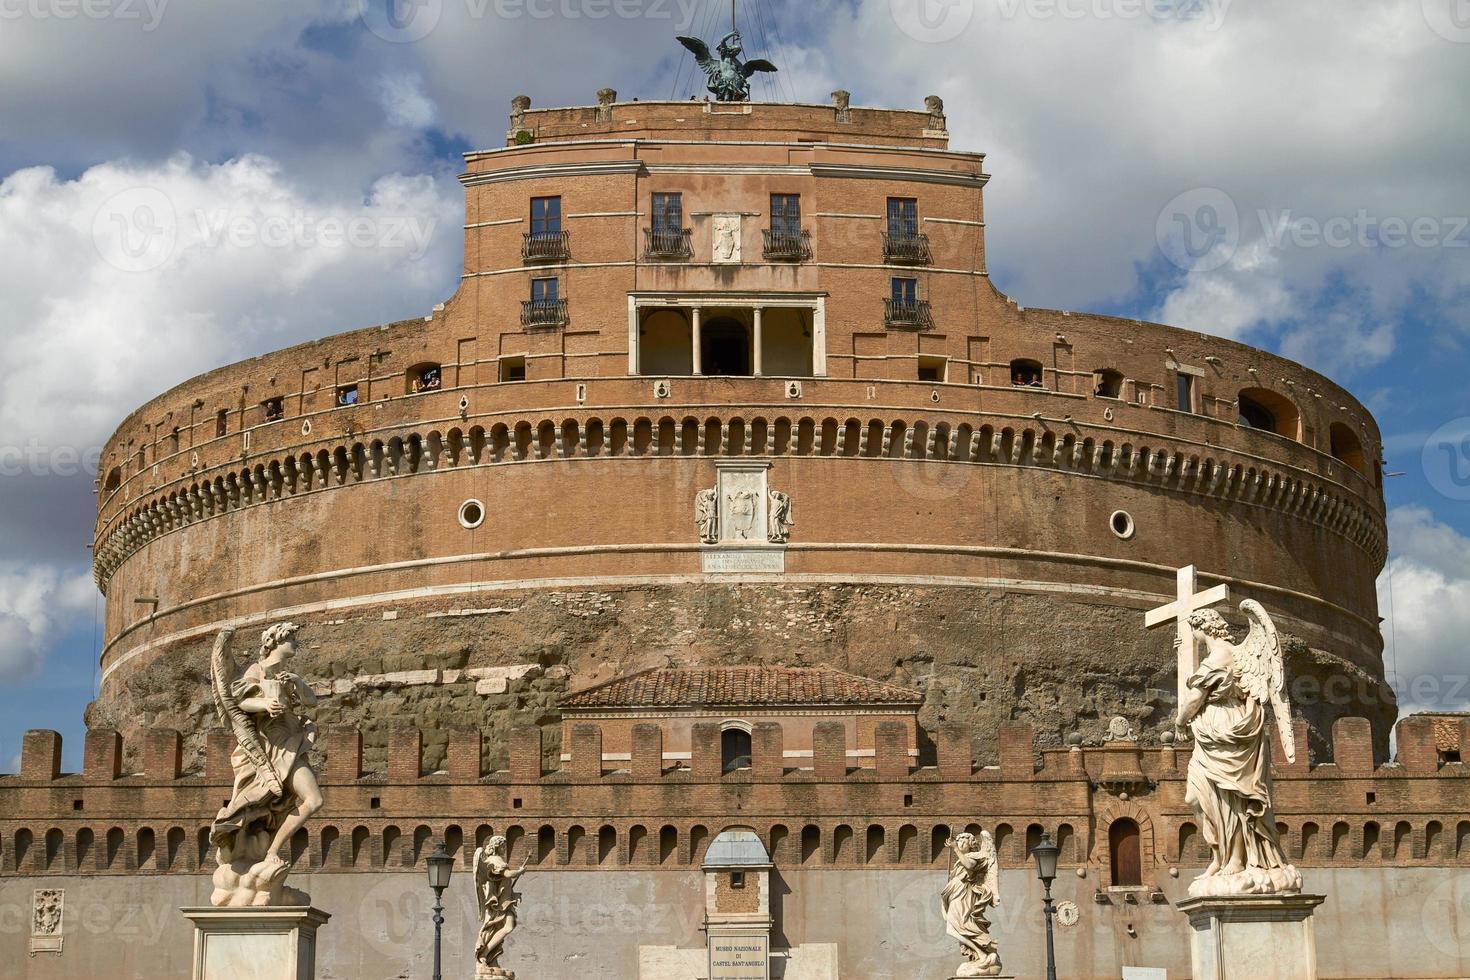 Castel SantAngelo in Rome Italy photo